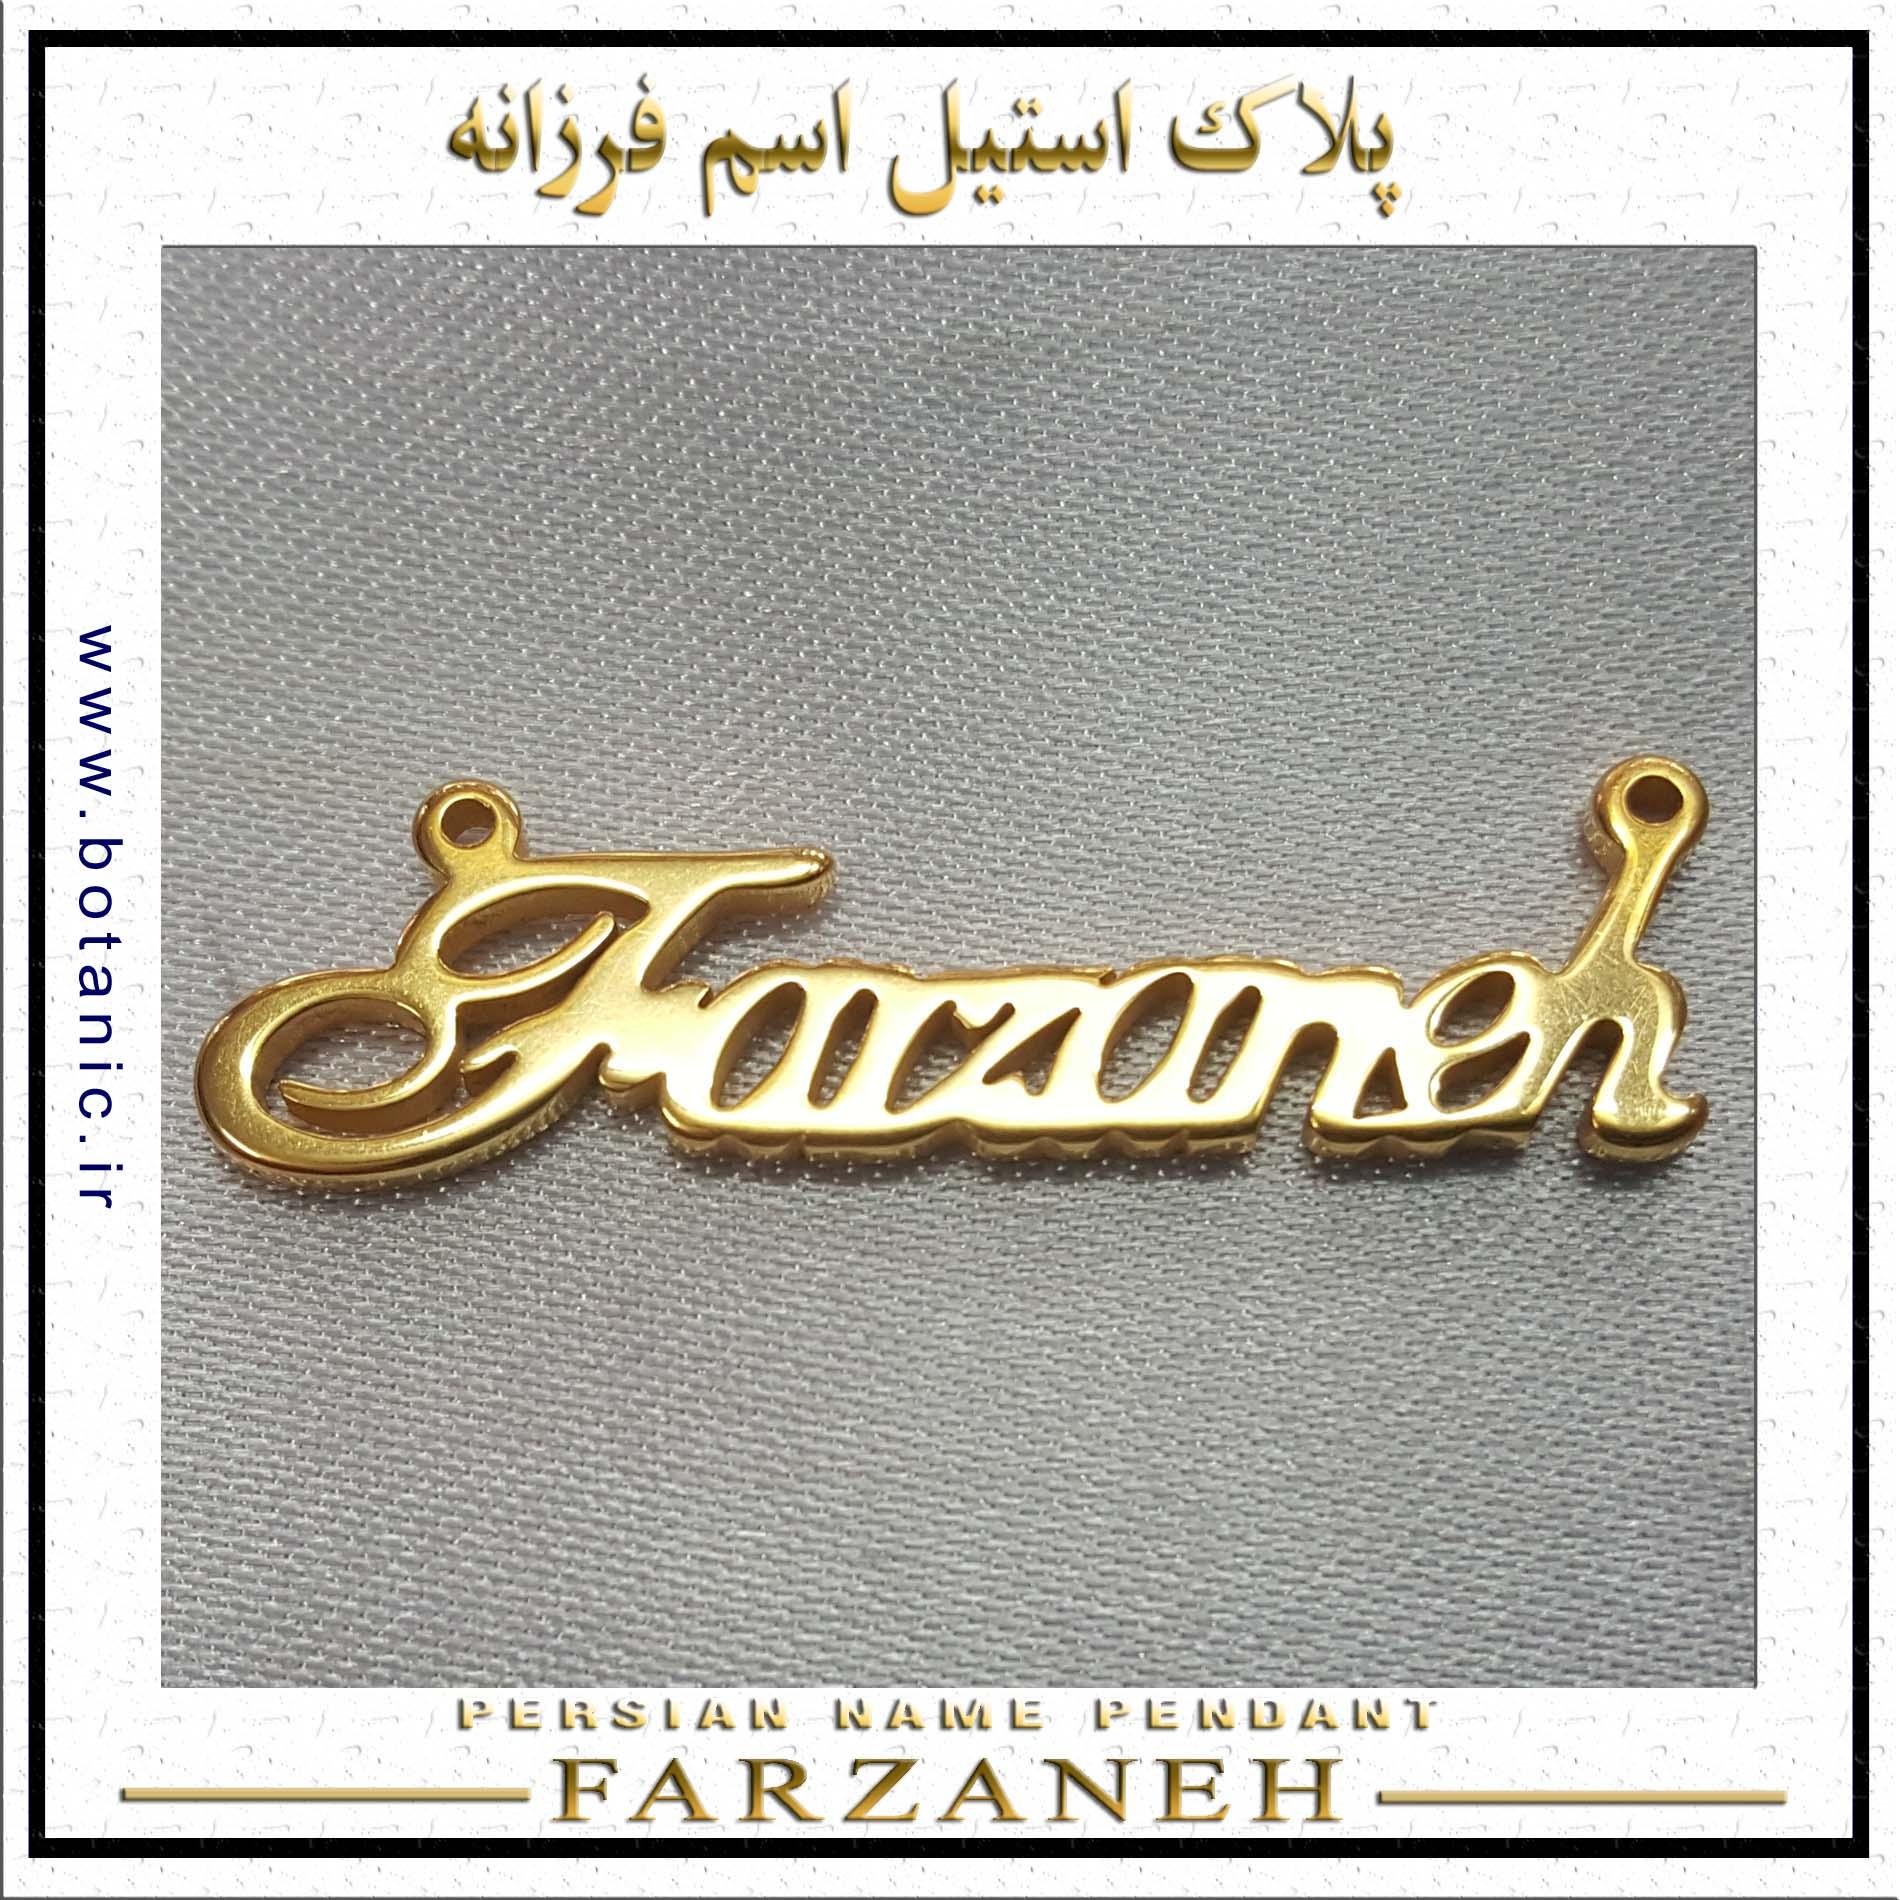 Iranian Name Pendant Farzaneh